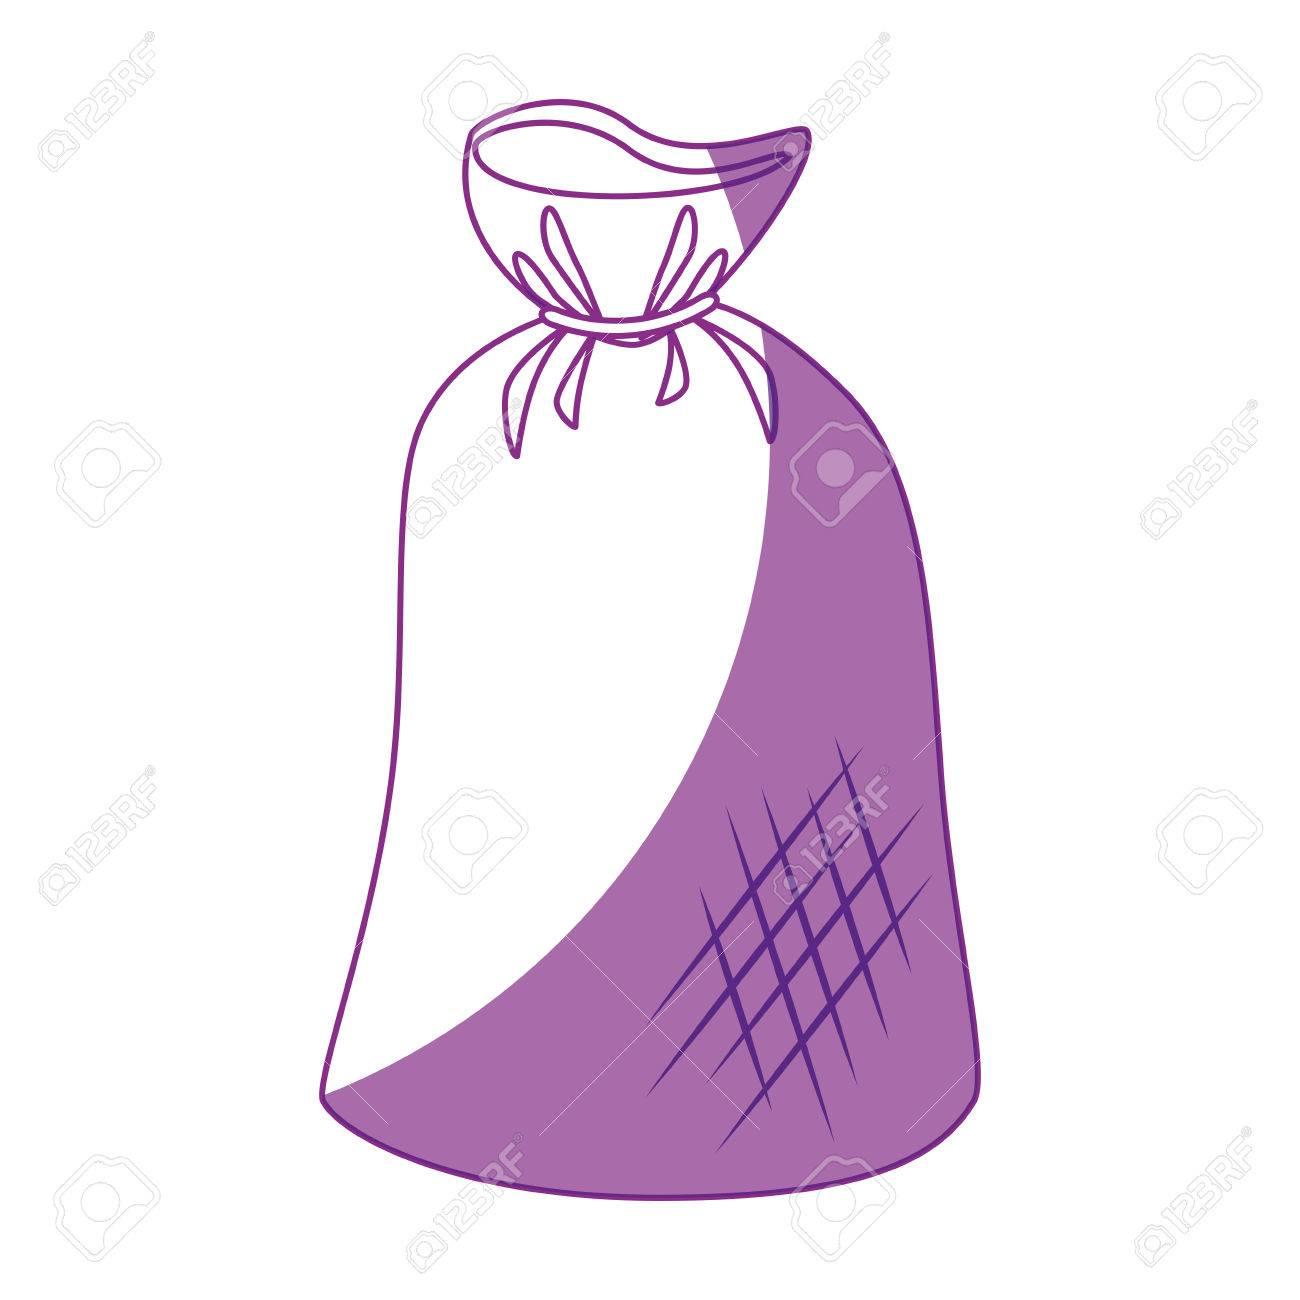 1300x1300 Trash Bag Icon Over White Background. Vector Illustration Royalty